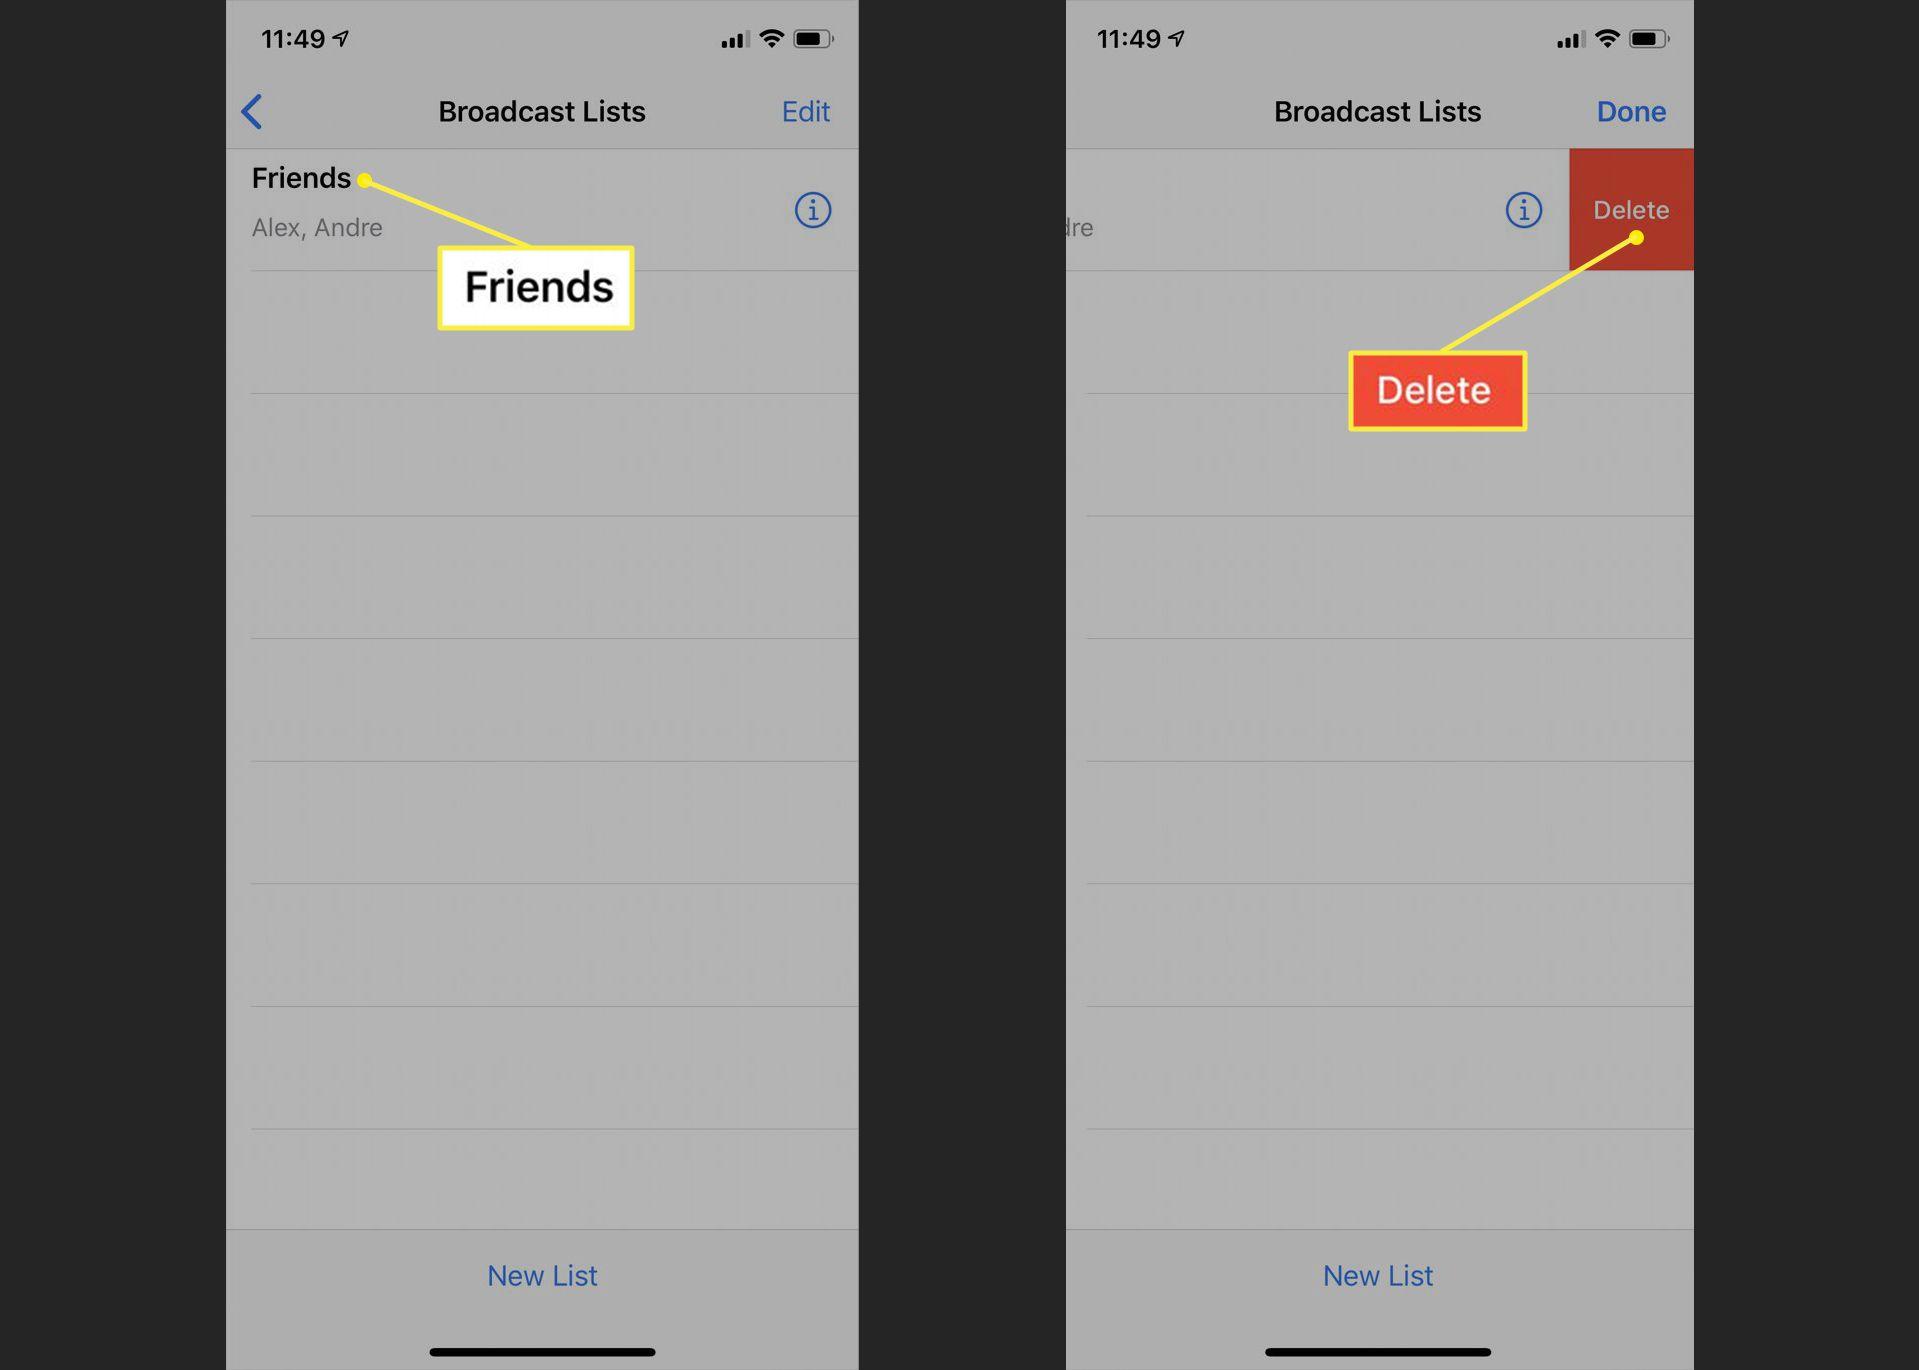 WhatsApp Broadcast List showing Delete option